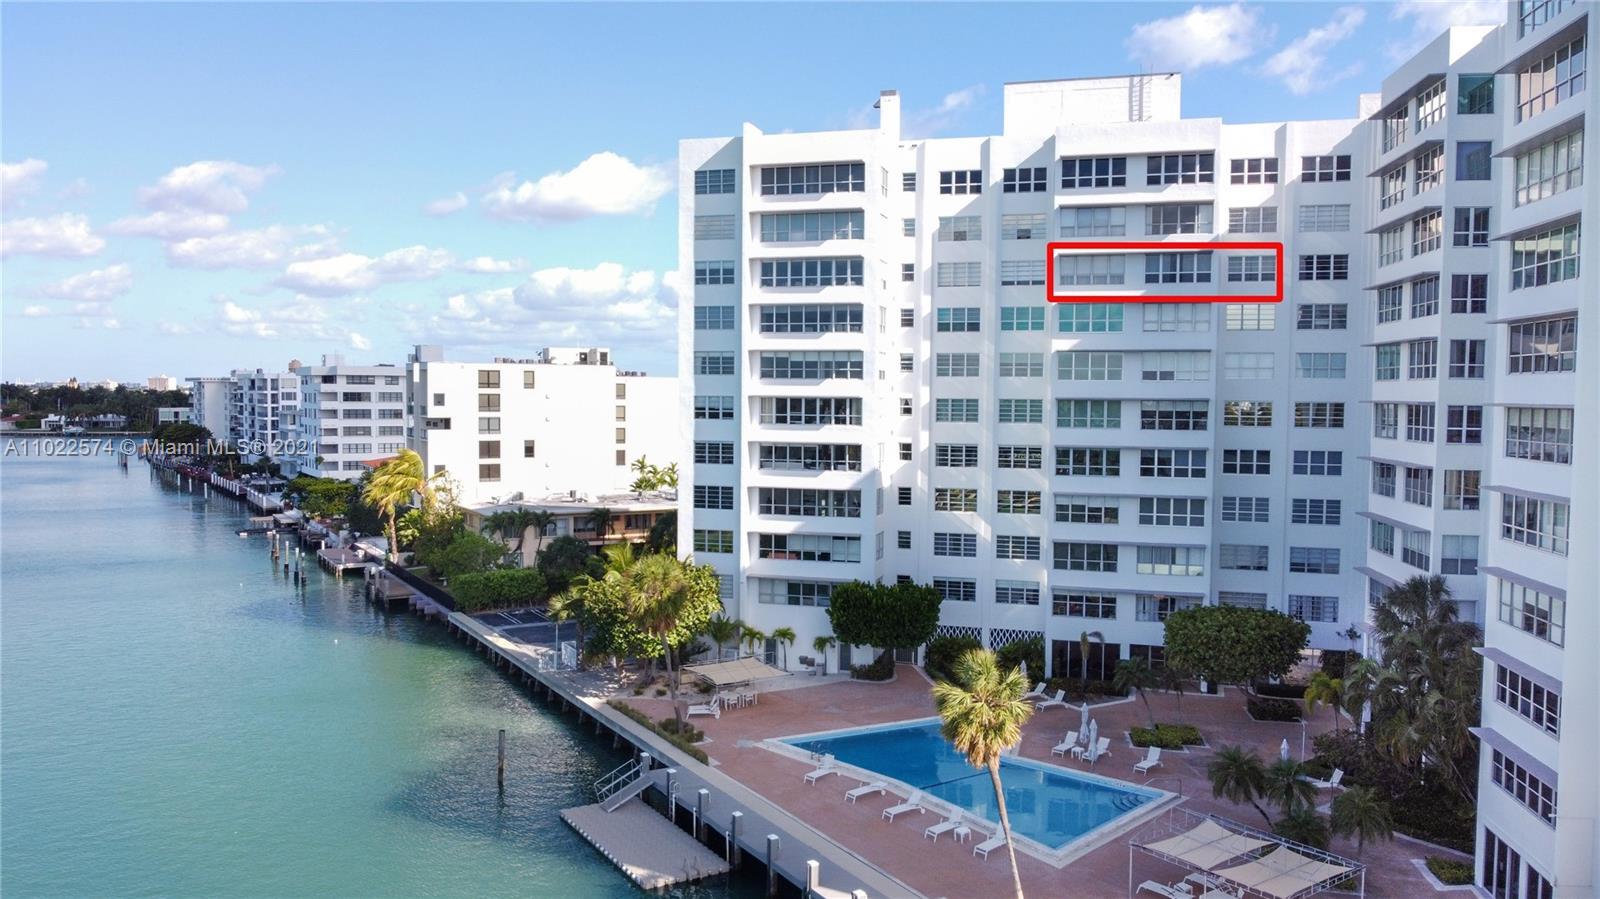 Blair House #9BW - 9102 W Bay Harbor Dr #9BW, Bay Harbor Islands, FL 33154